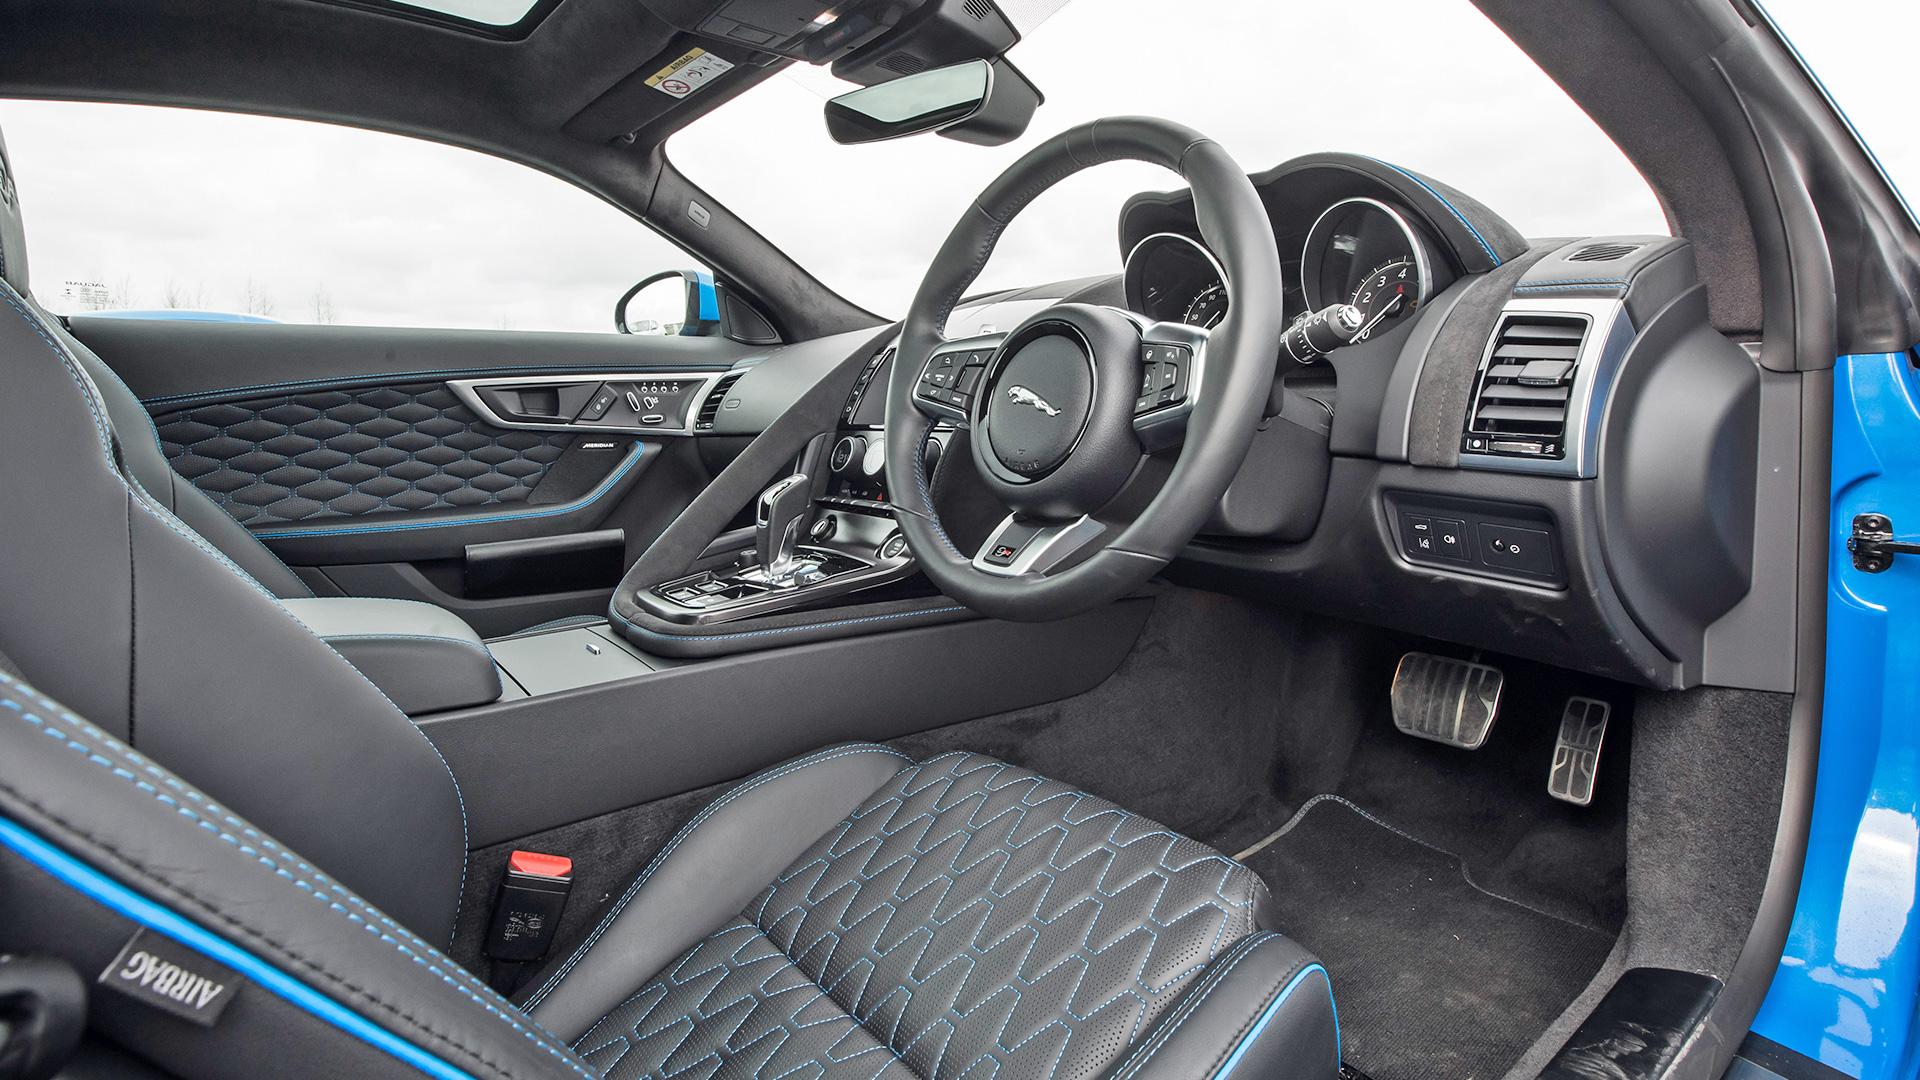 Jaguar F Type 2018 Svr Interior Car Photos Overdrive